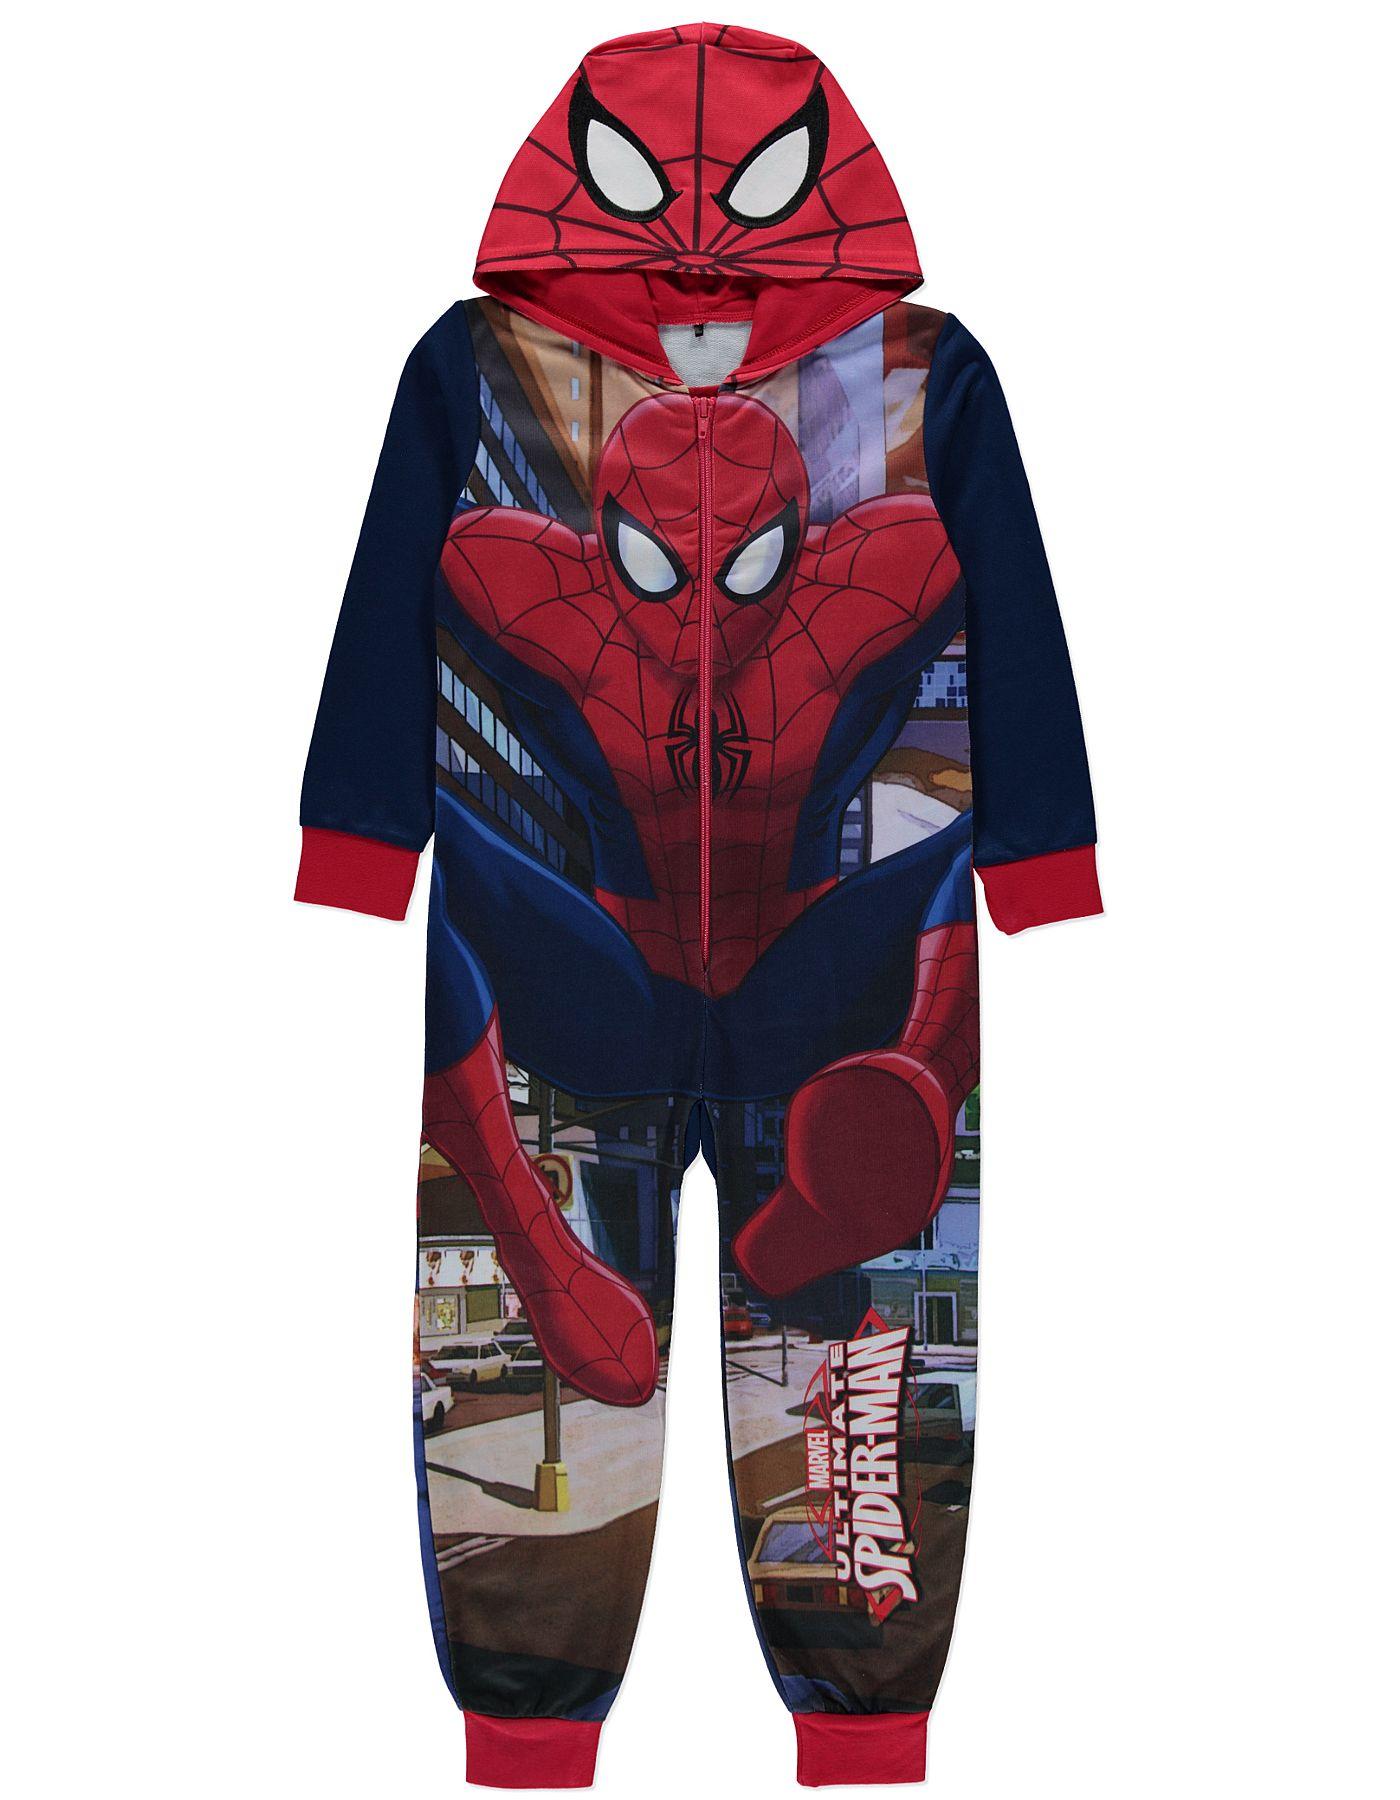 37eec4a10330 Marvel Ultimate Spiderman Onesie